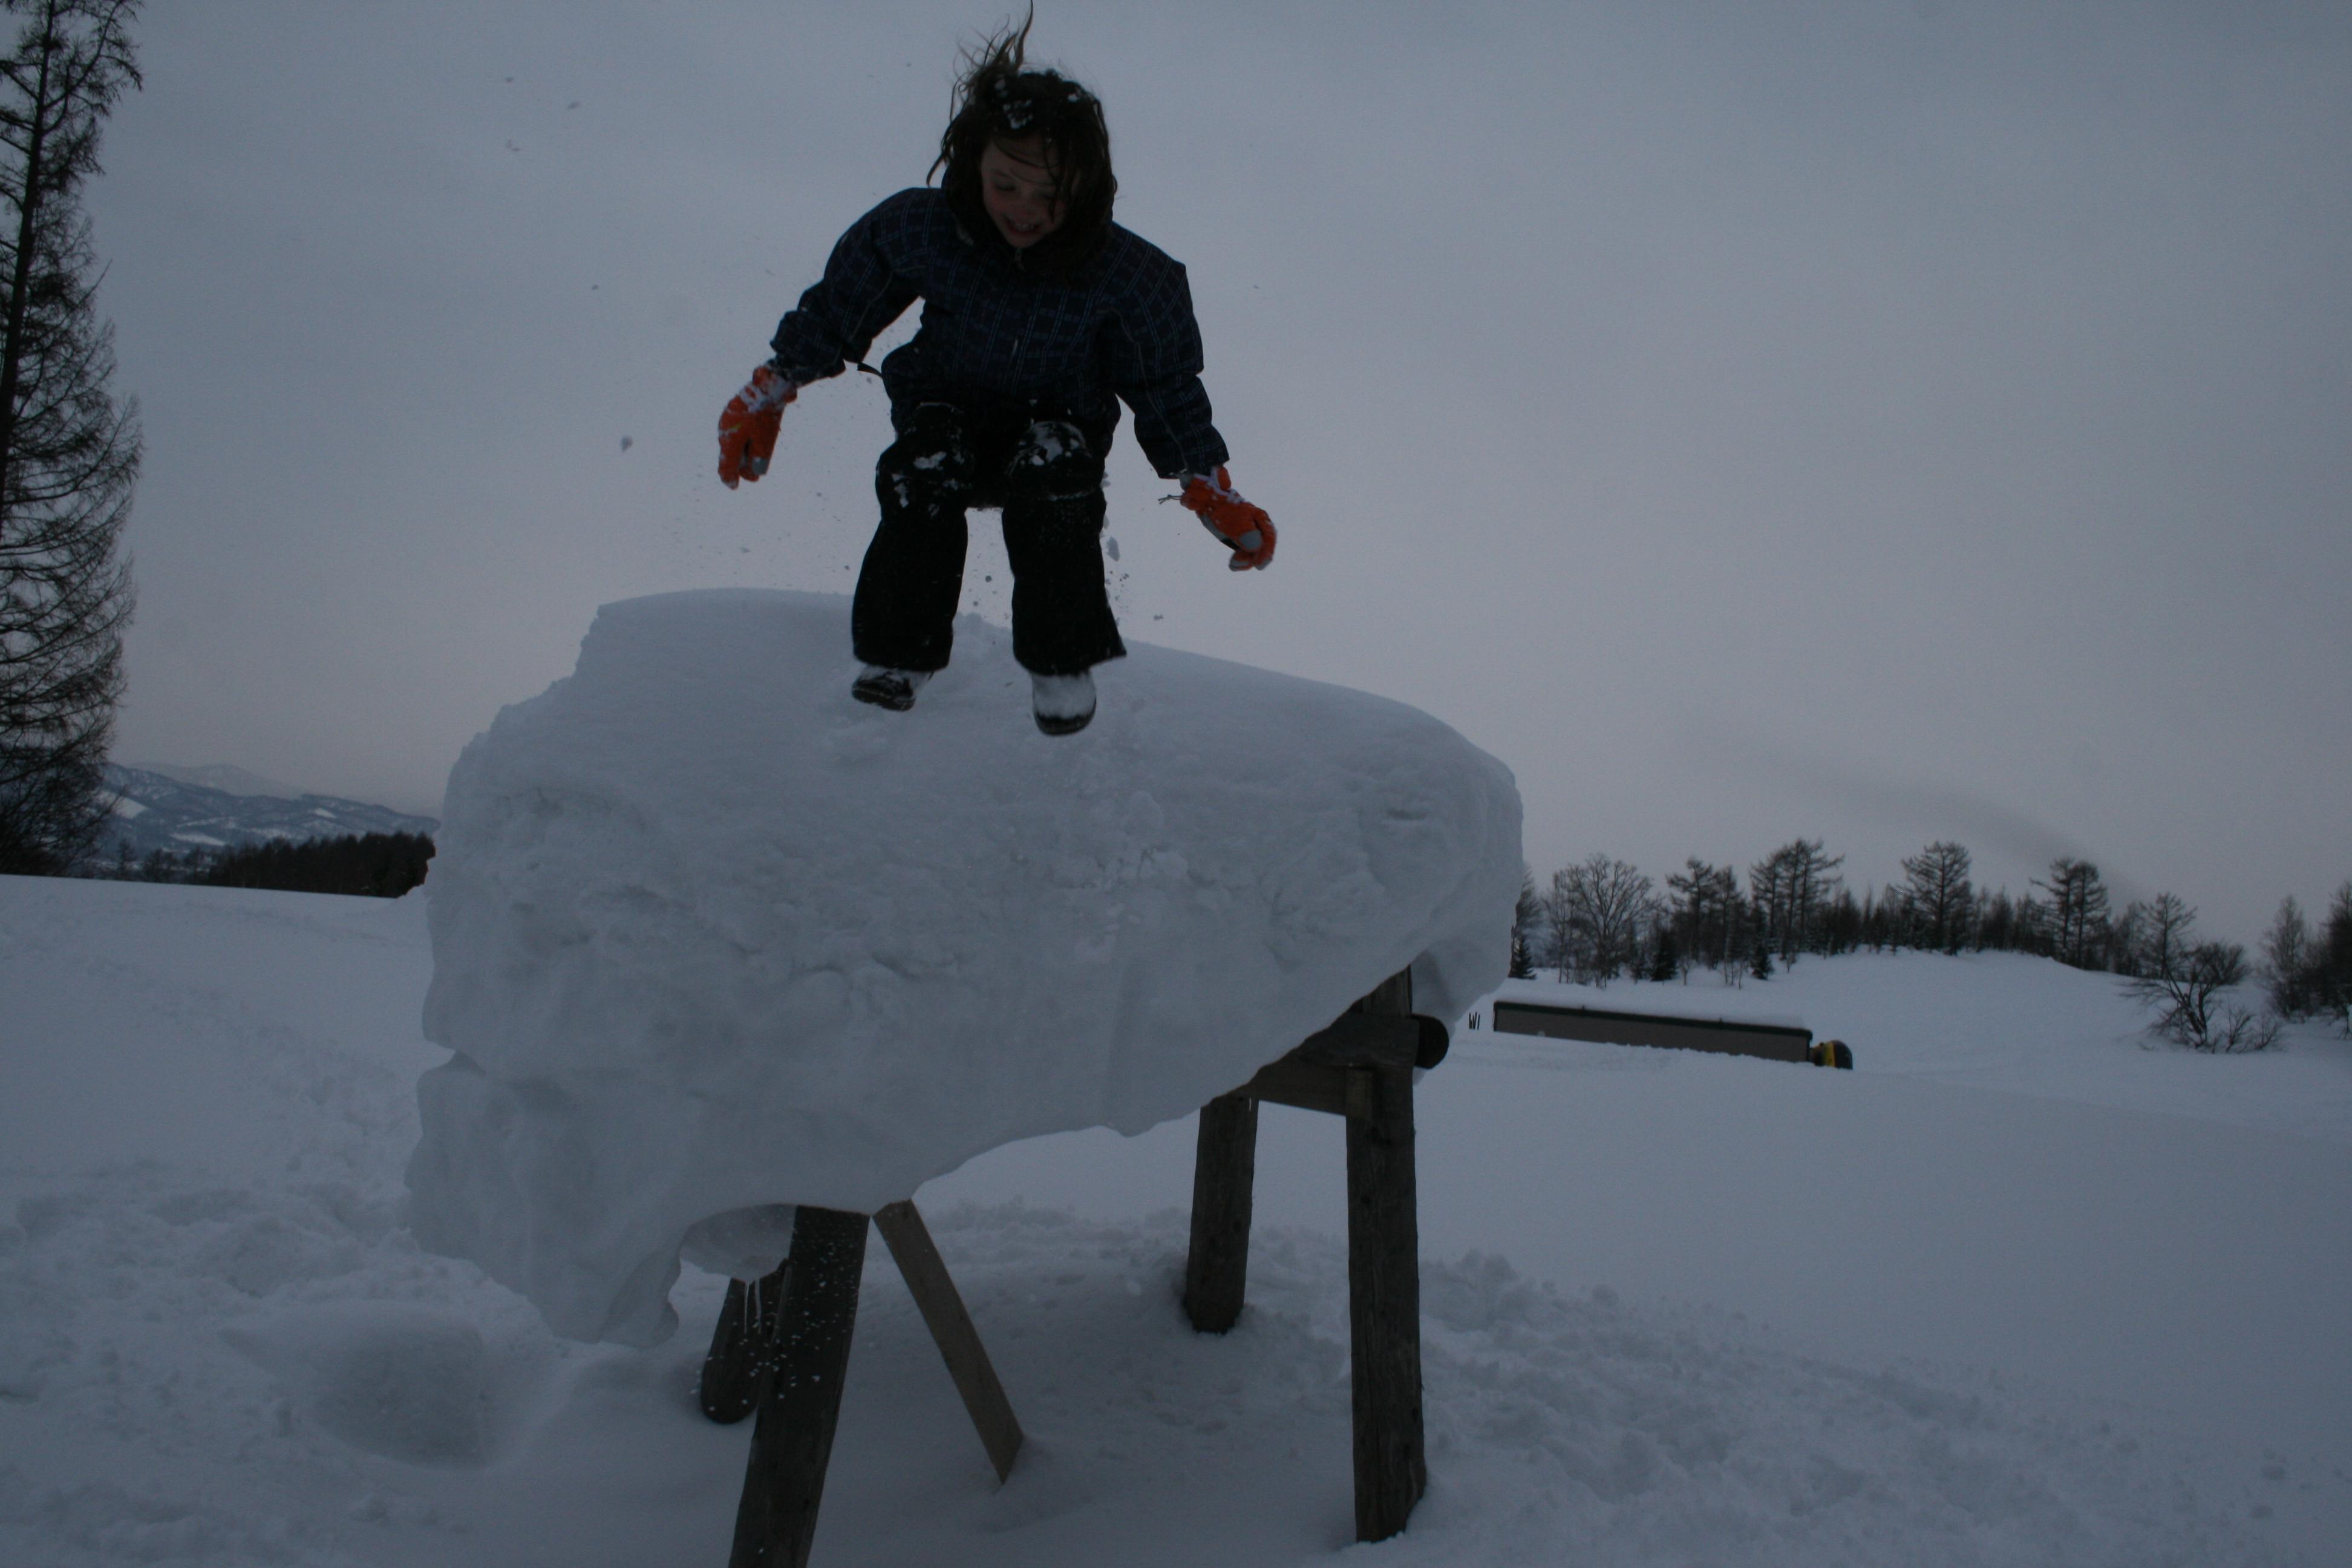 Rodger Family 4m high snow pillow, Niseko Village